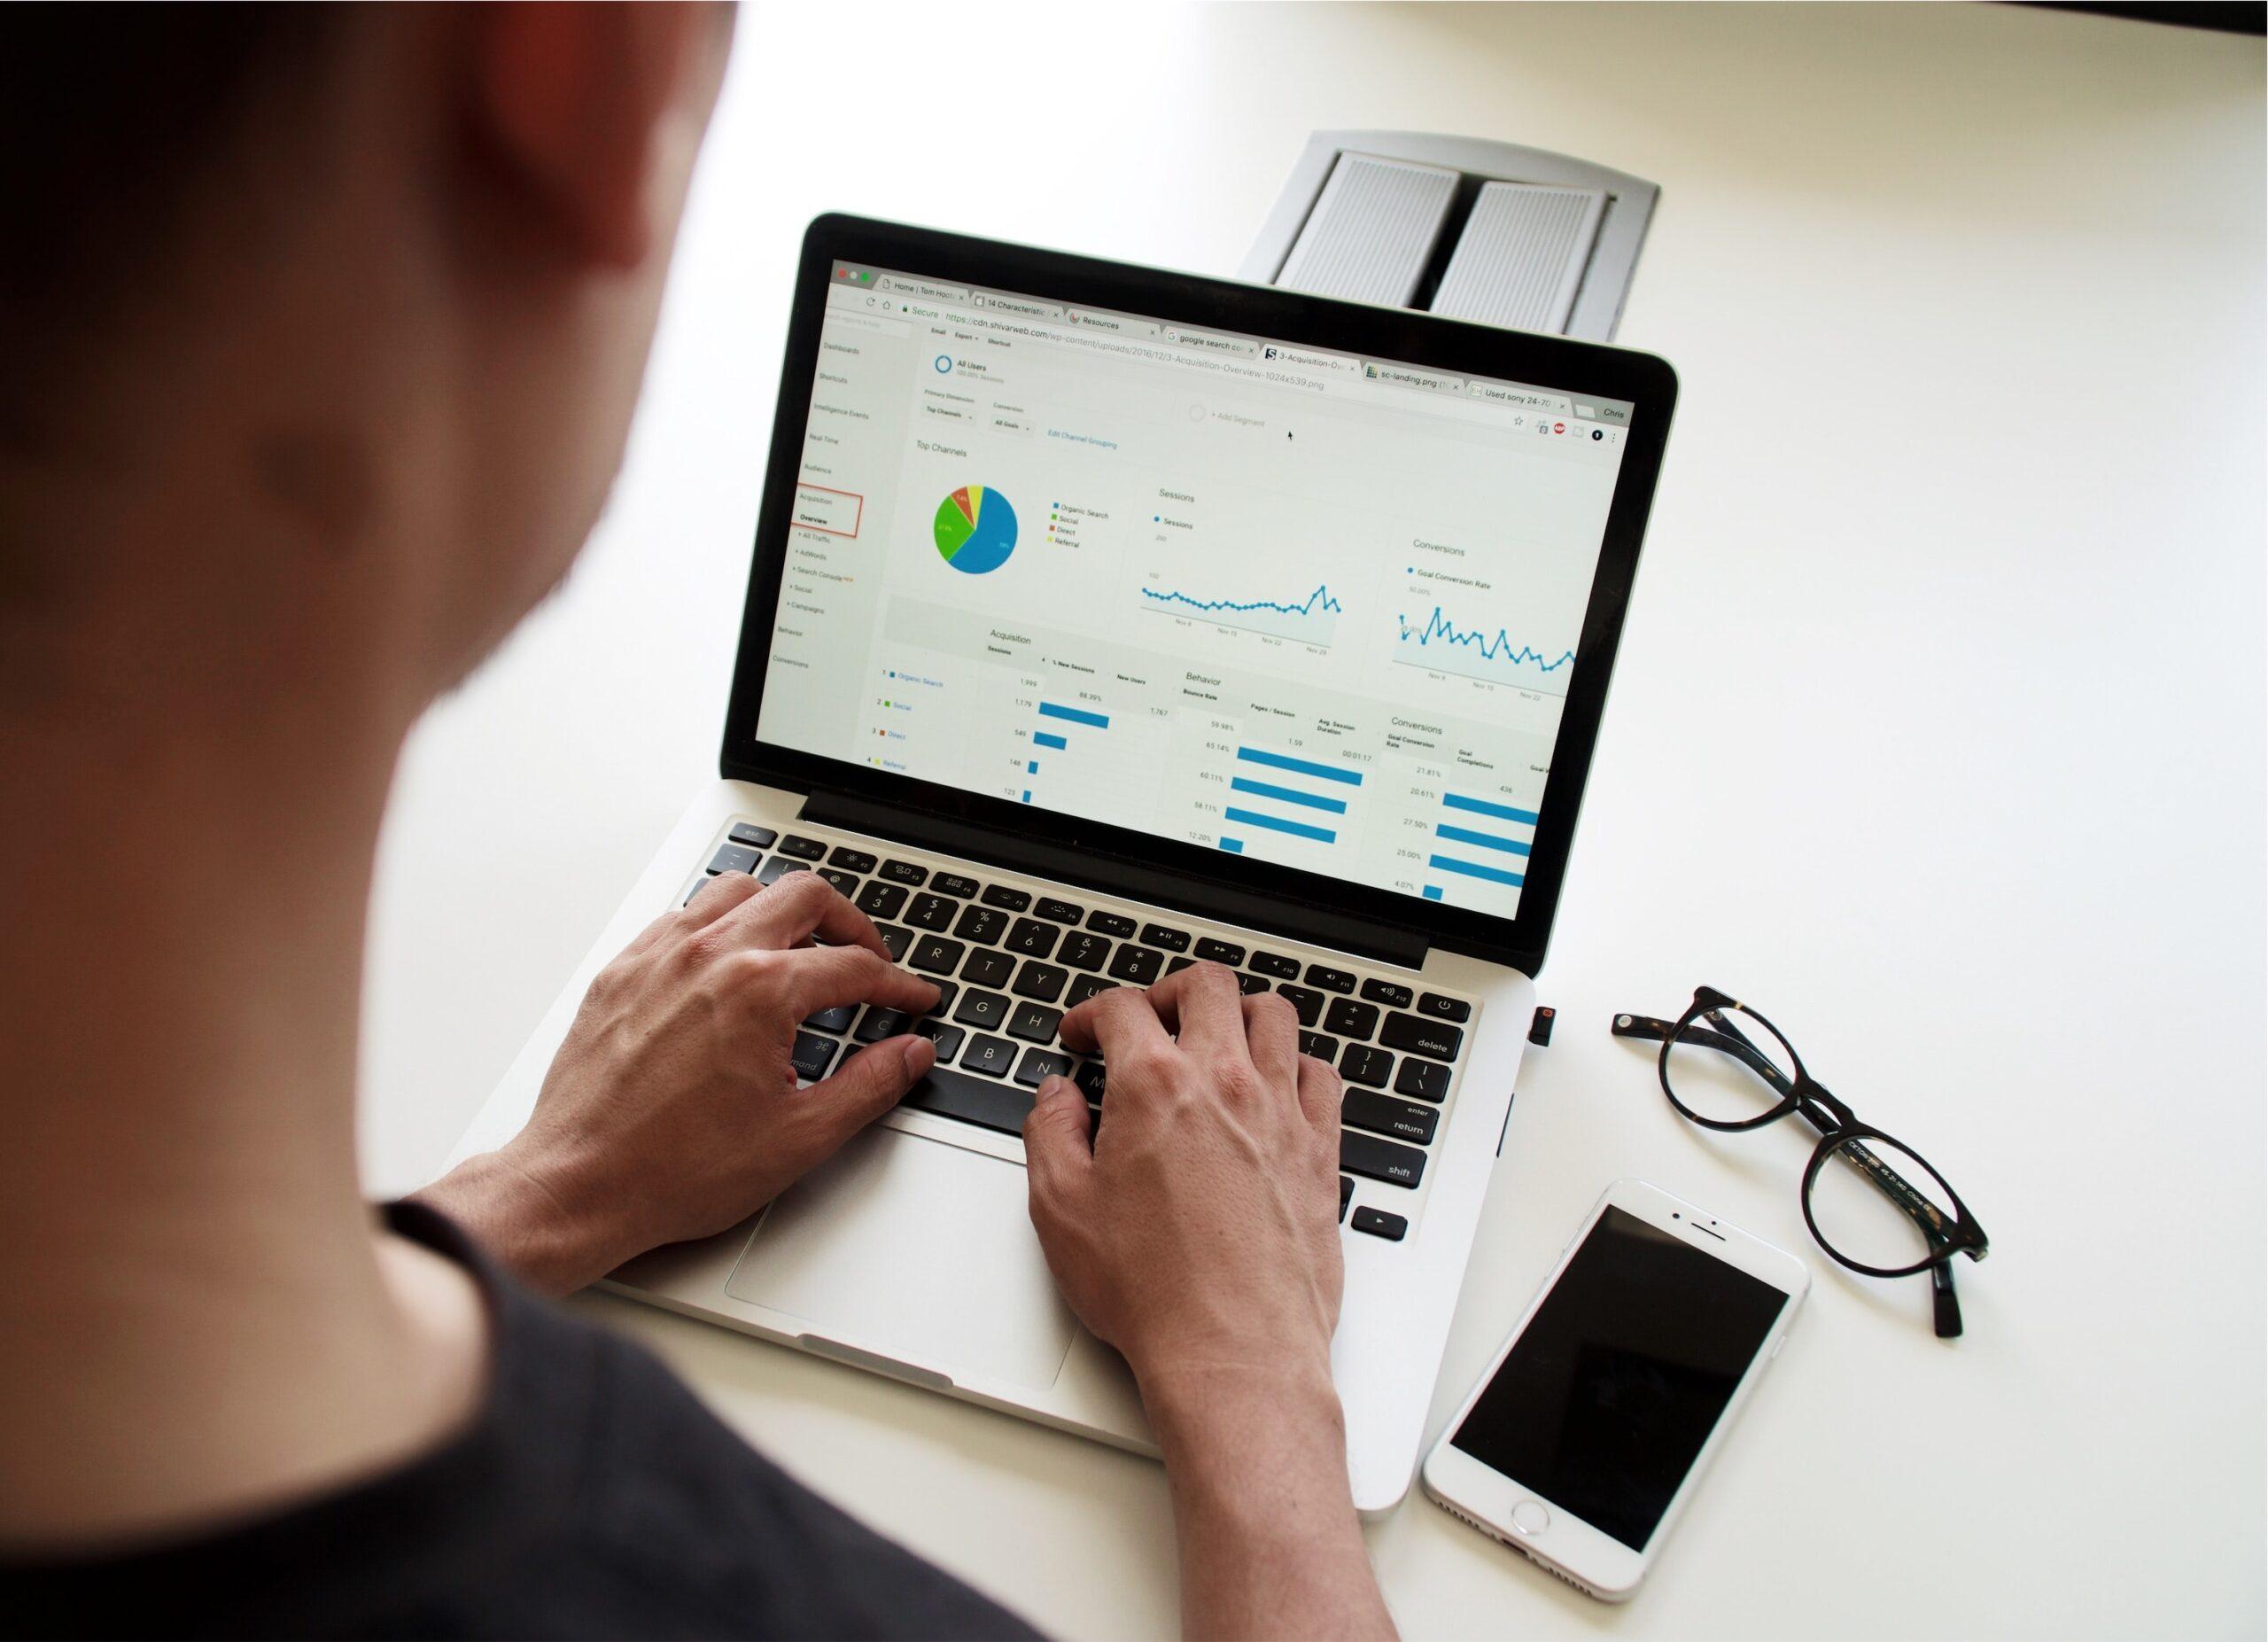 49 cursos online de Marketing gratuitos